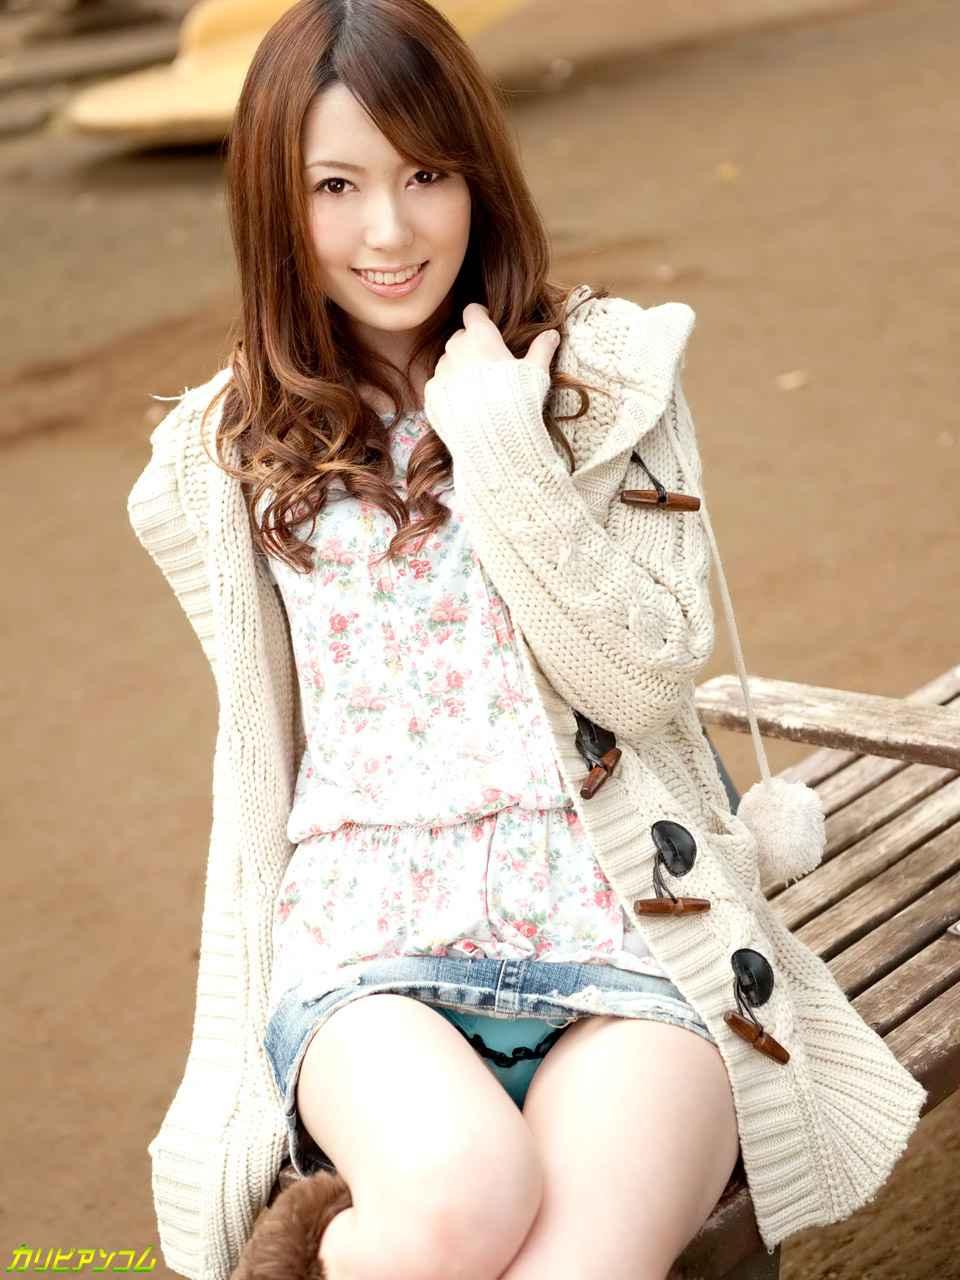 Yui Hatano - Photo Gallery - Xslist.org